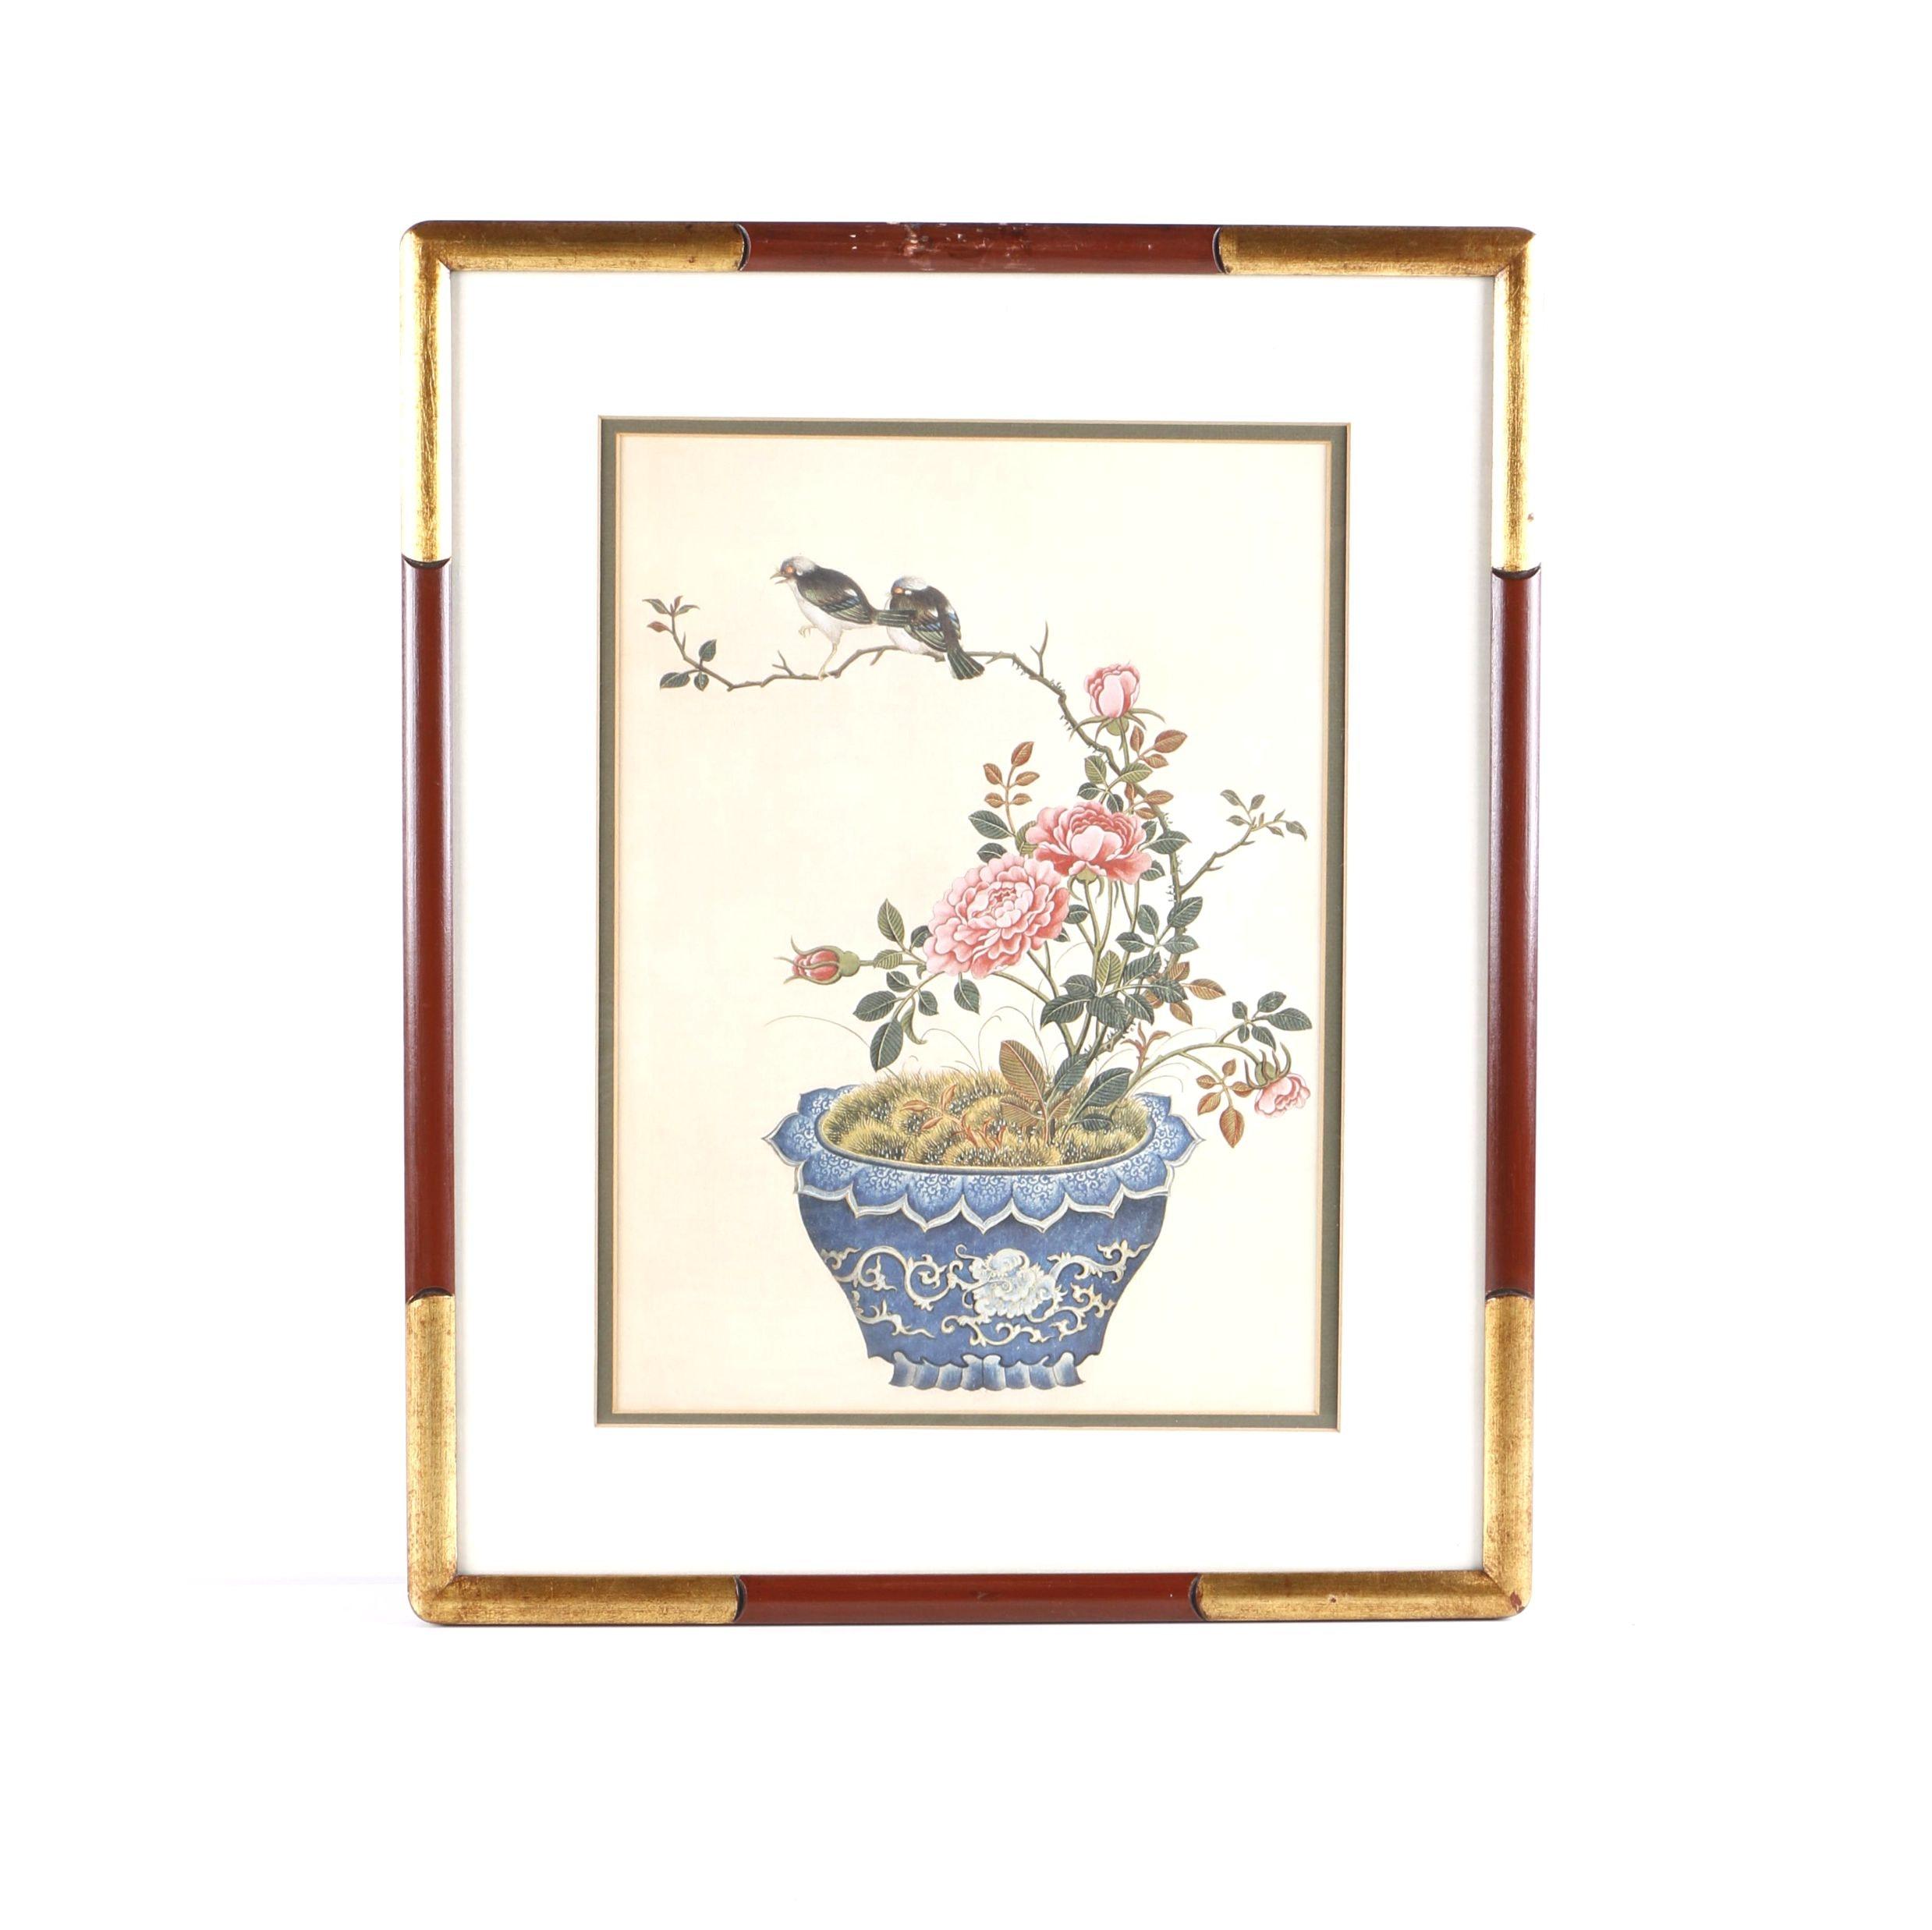 "Marad Wall Decor Corp Giclee Print ""Flowers & Birds"""